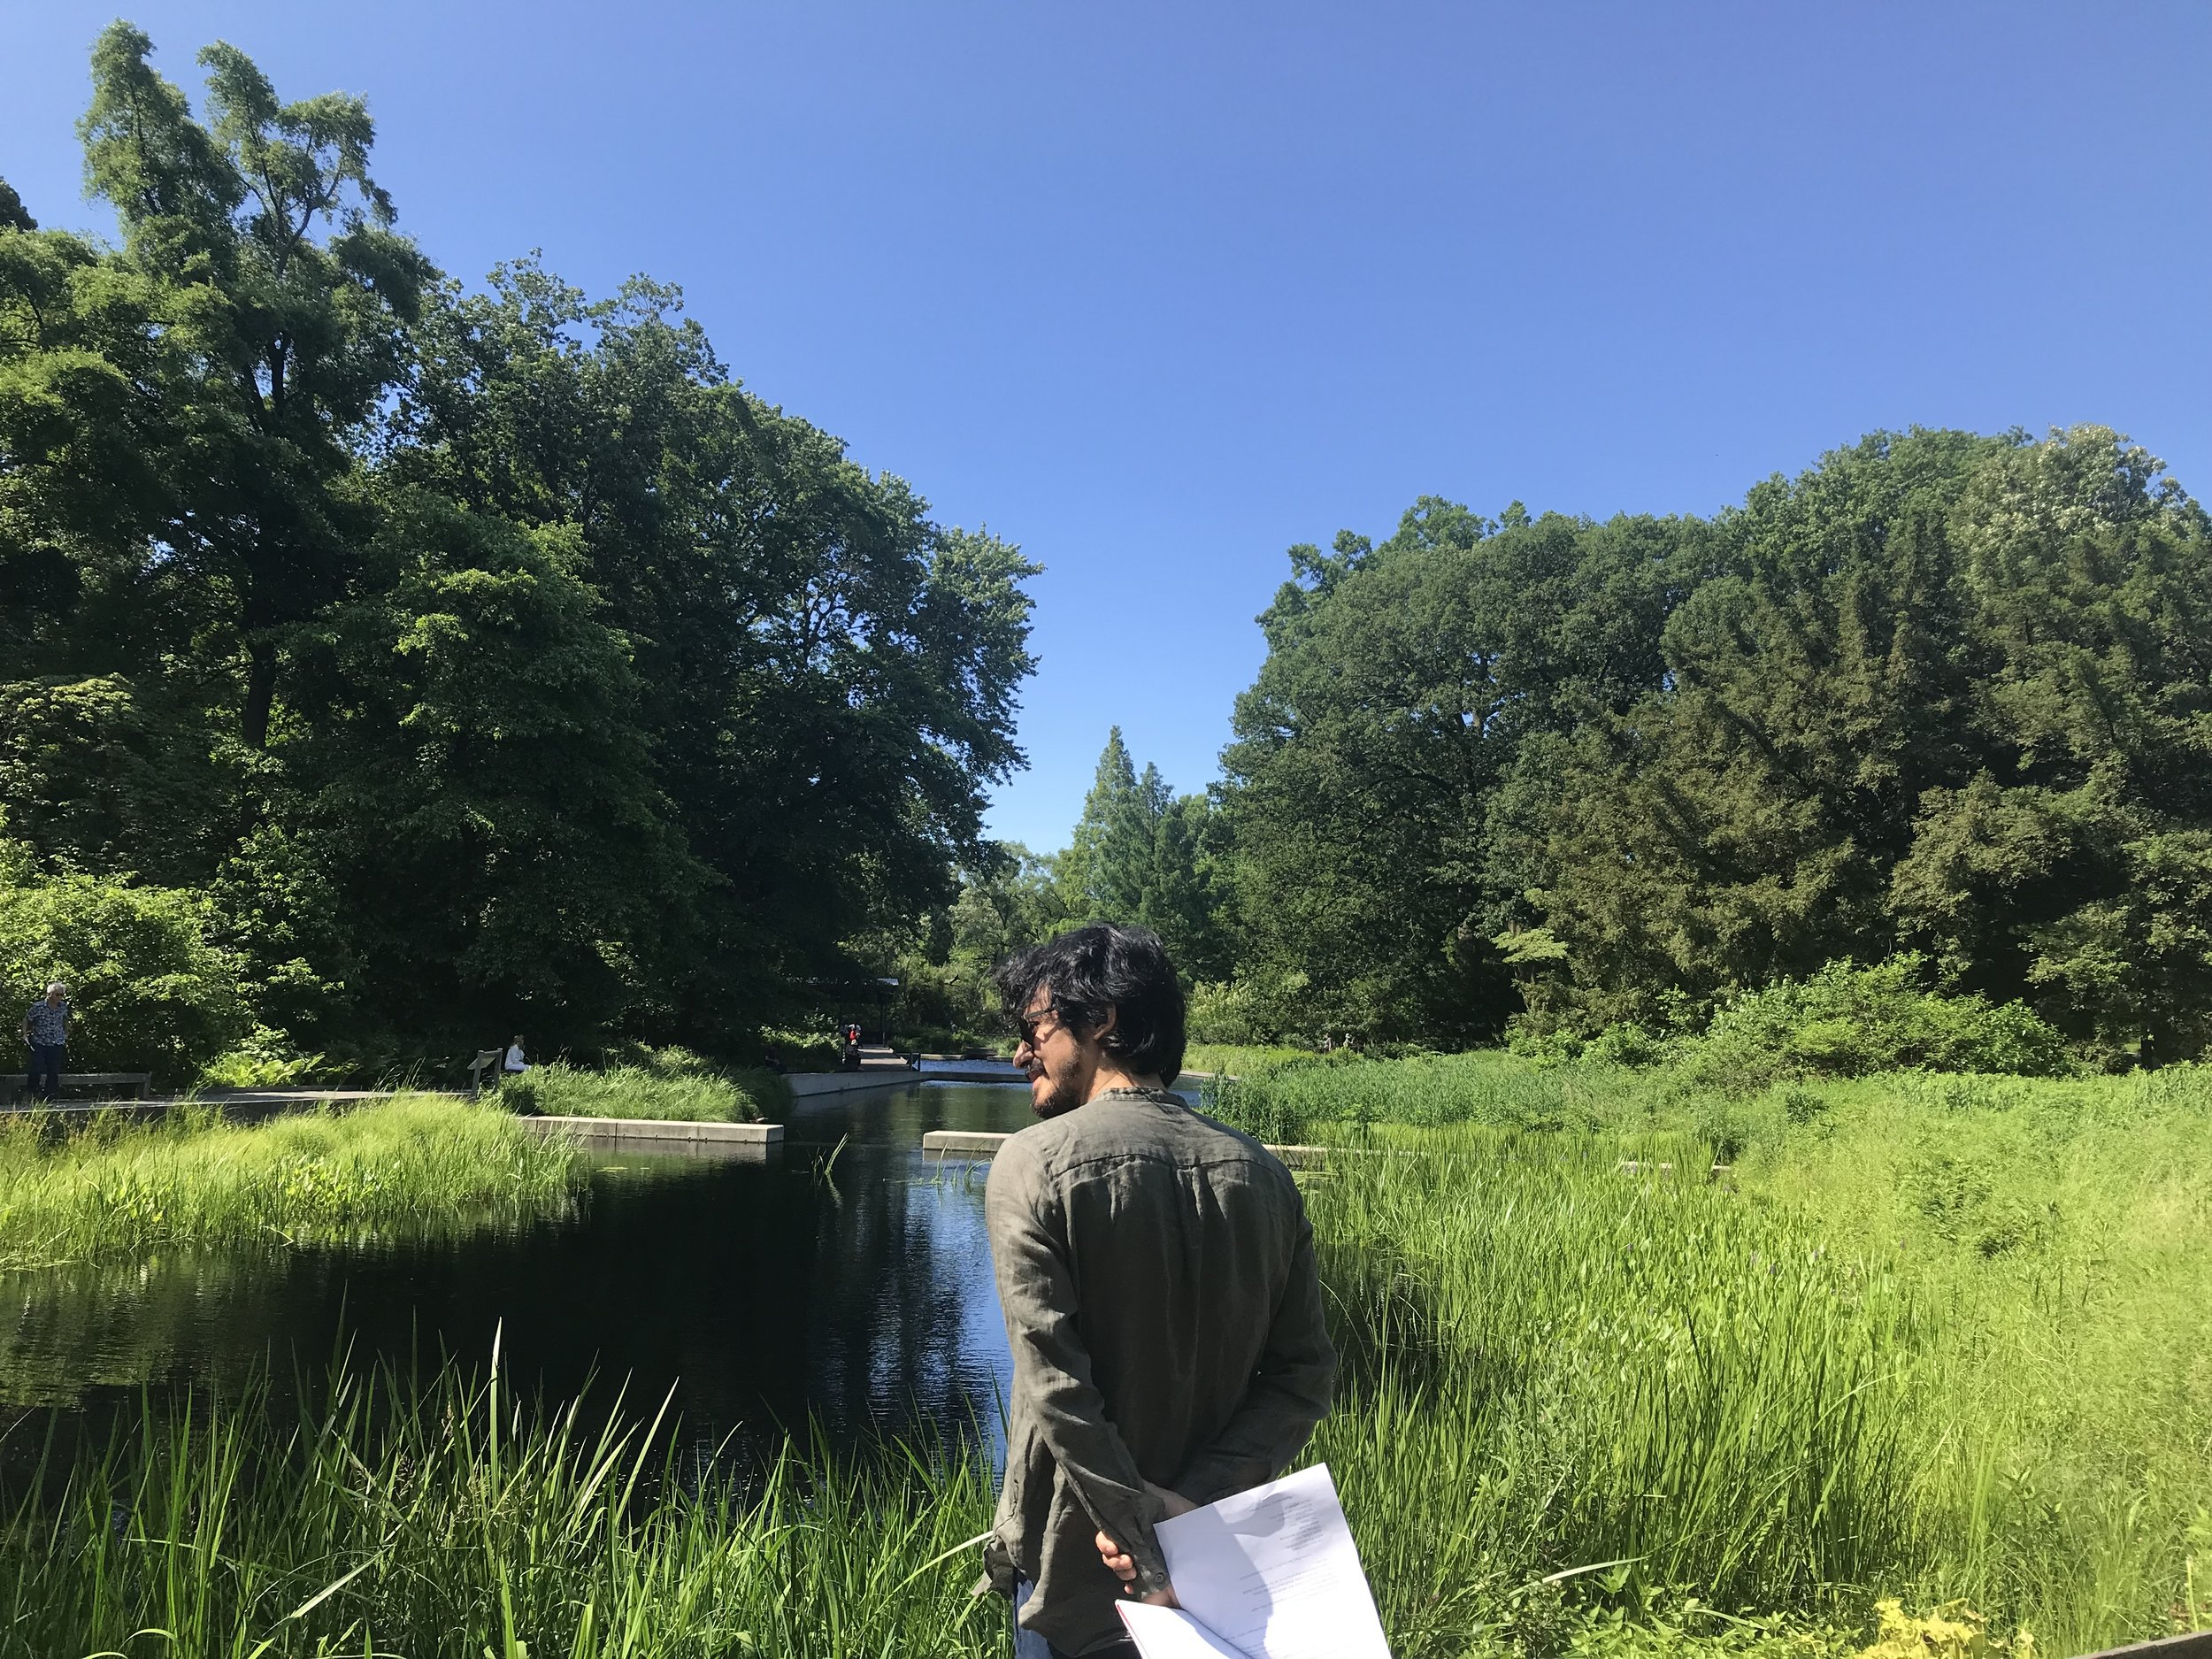 Fellow Rohan Chhetri exploring the New York Botanical Gardens!